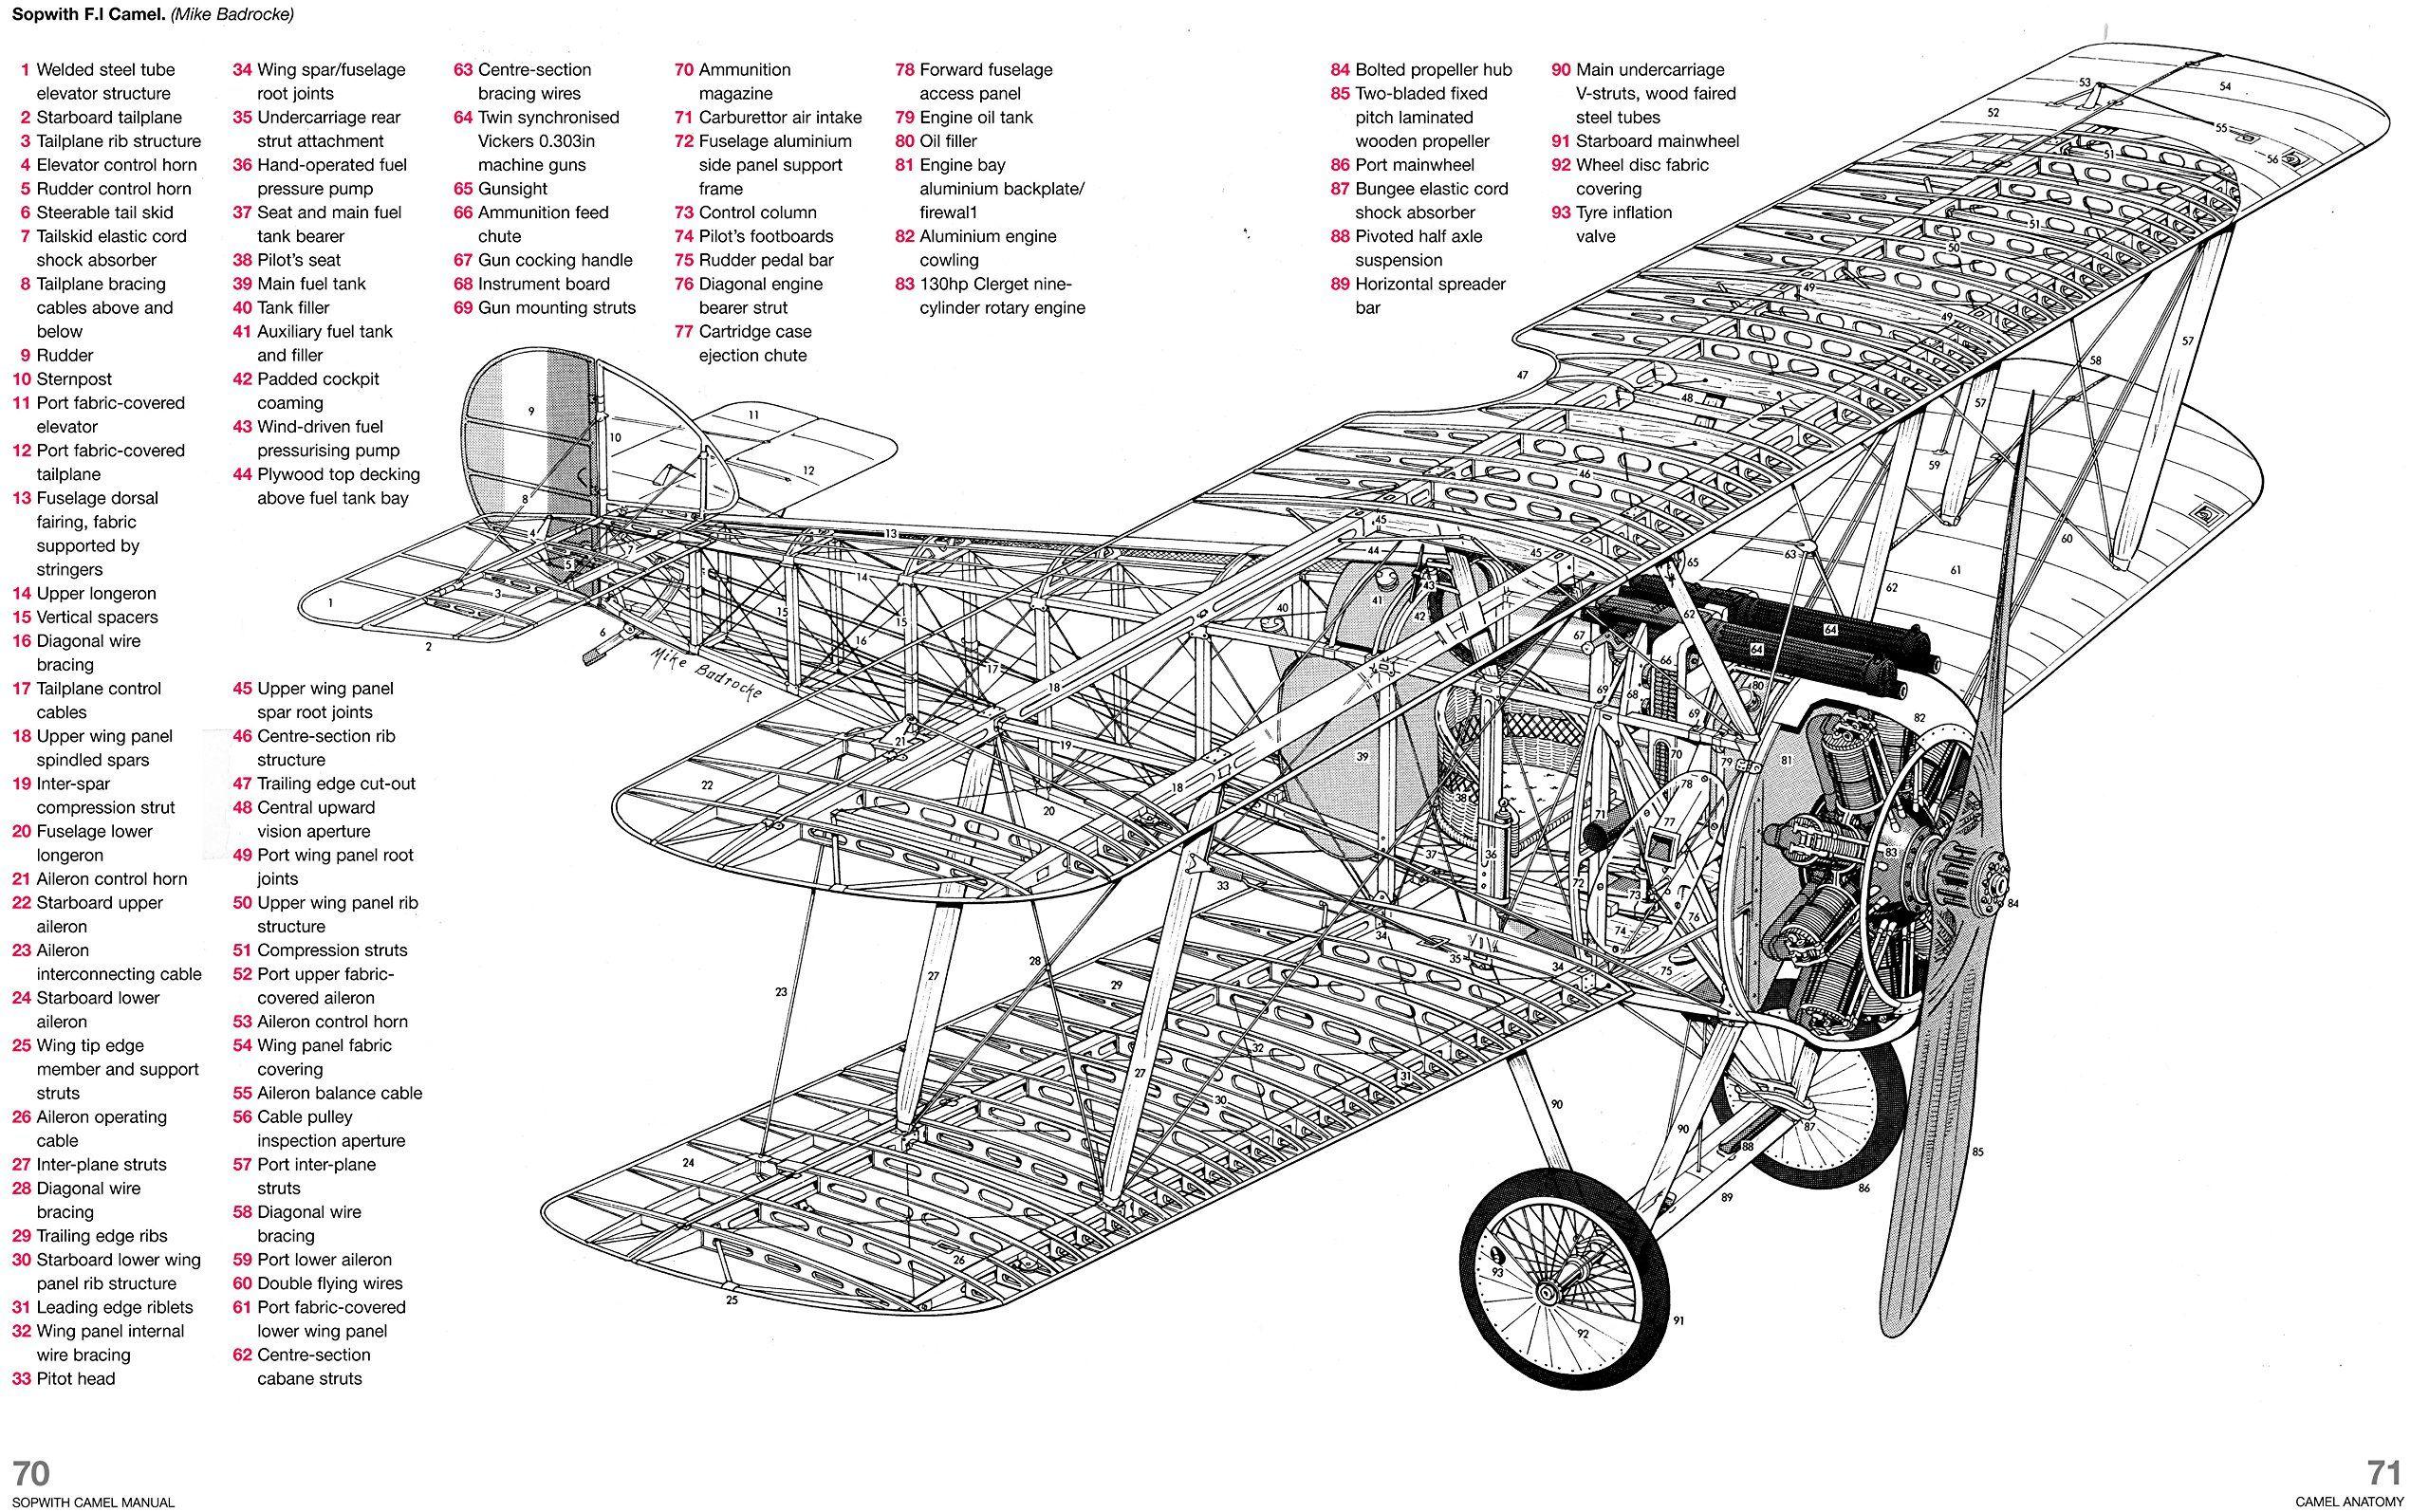 Reading Aircraft Wiring Diagrams 3000gt Ac Diagram Fighter Jet Engine - Imageresizertool.com